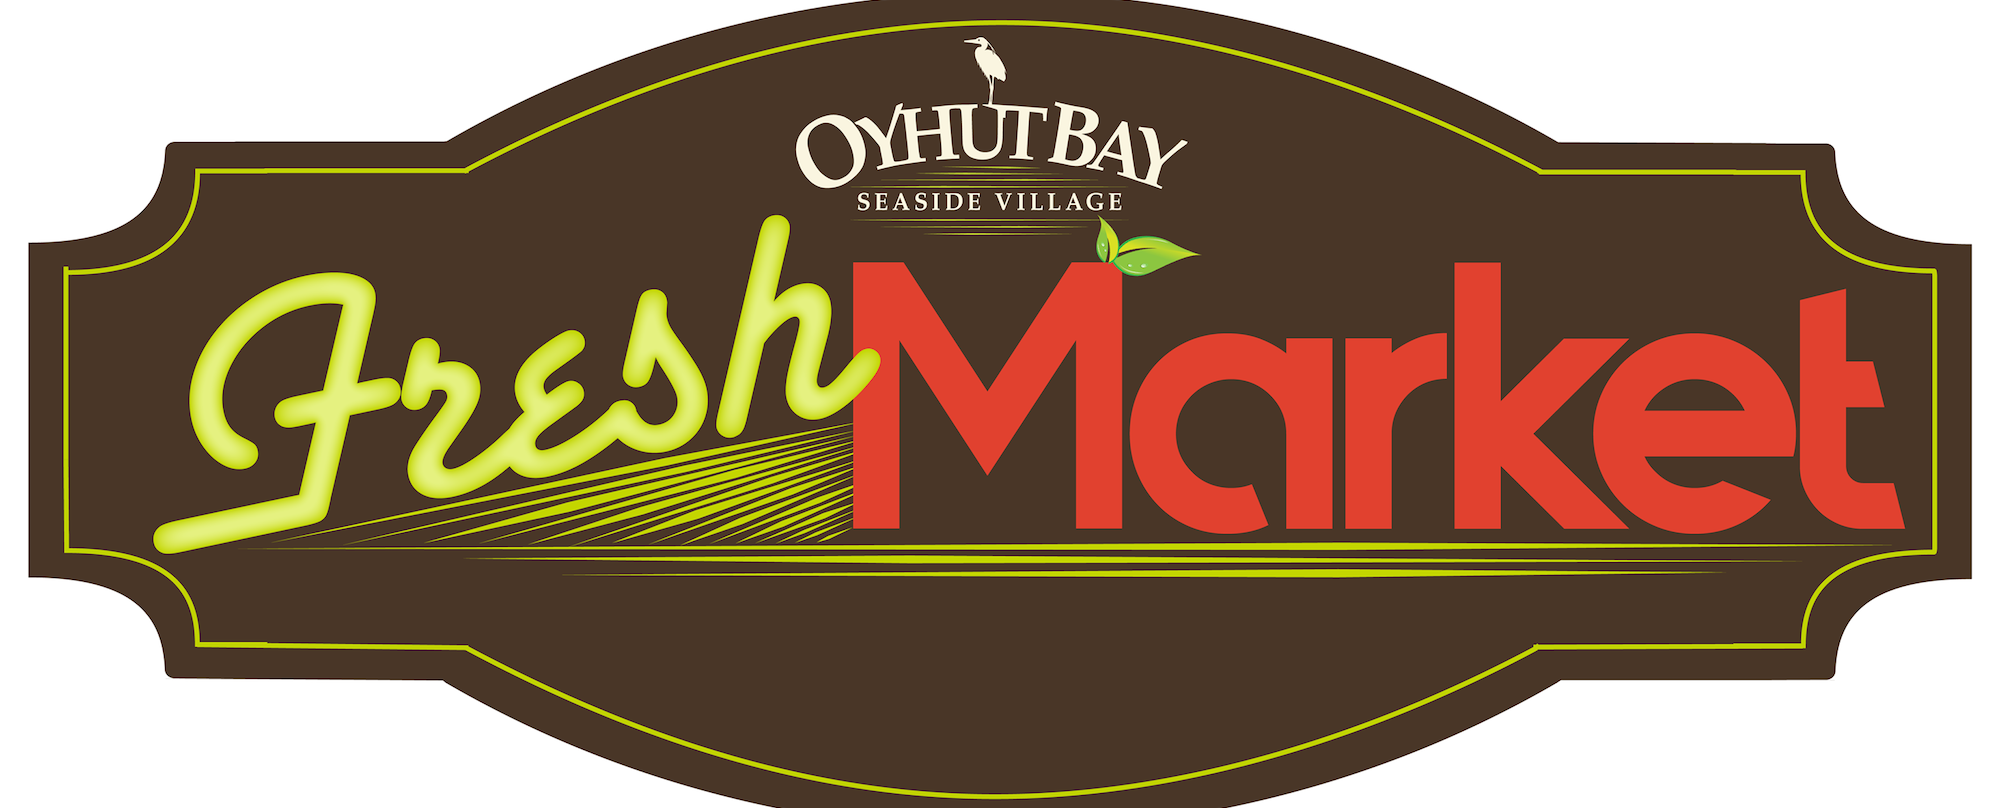 Oyhut Bay Fresh Market Grocery – Ocean Shores Washington